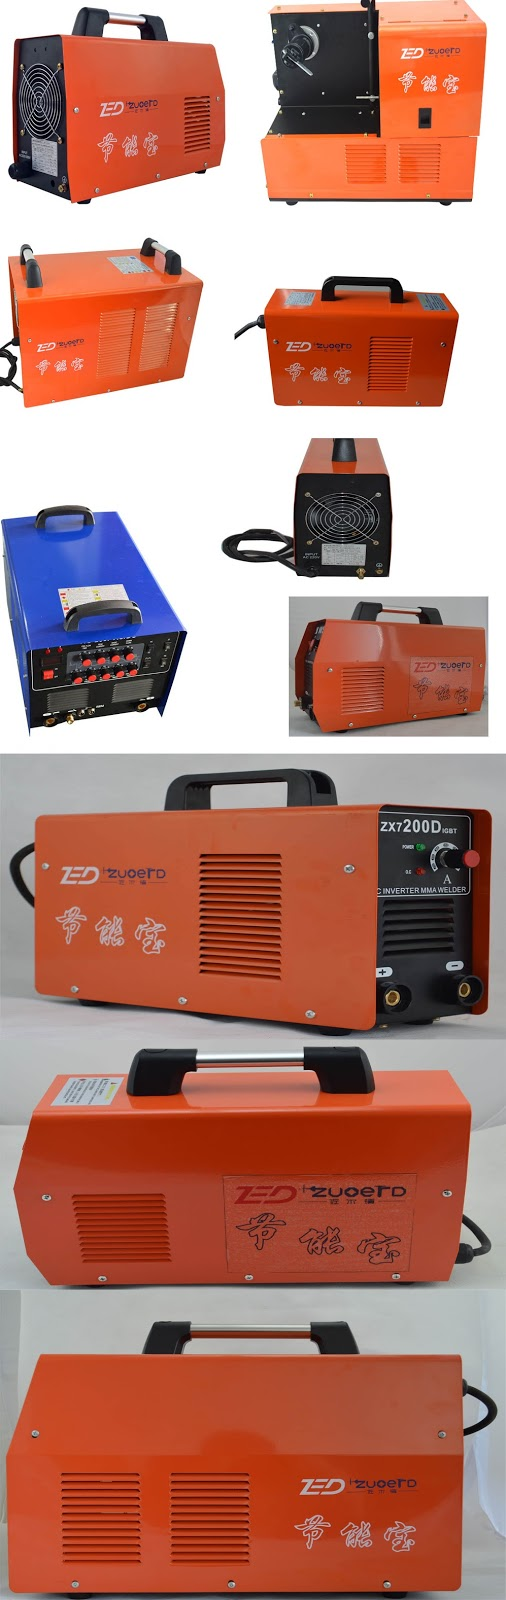 small resolution of mos dc inverter tig welder igbt gas shielded welding machine mos inverter air plasma cutting